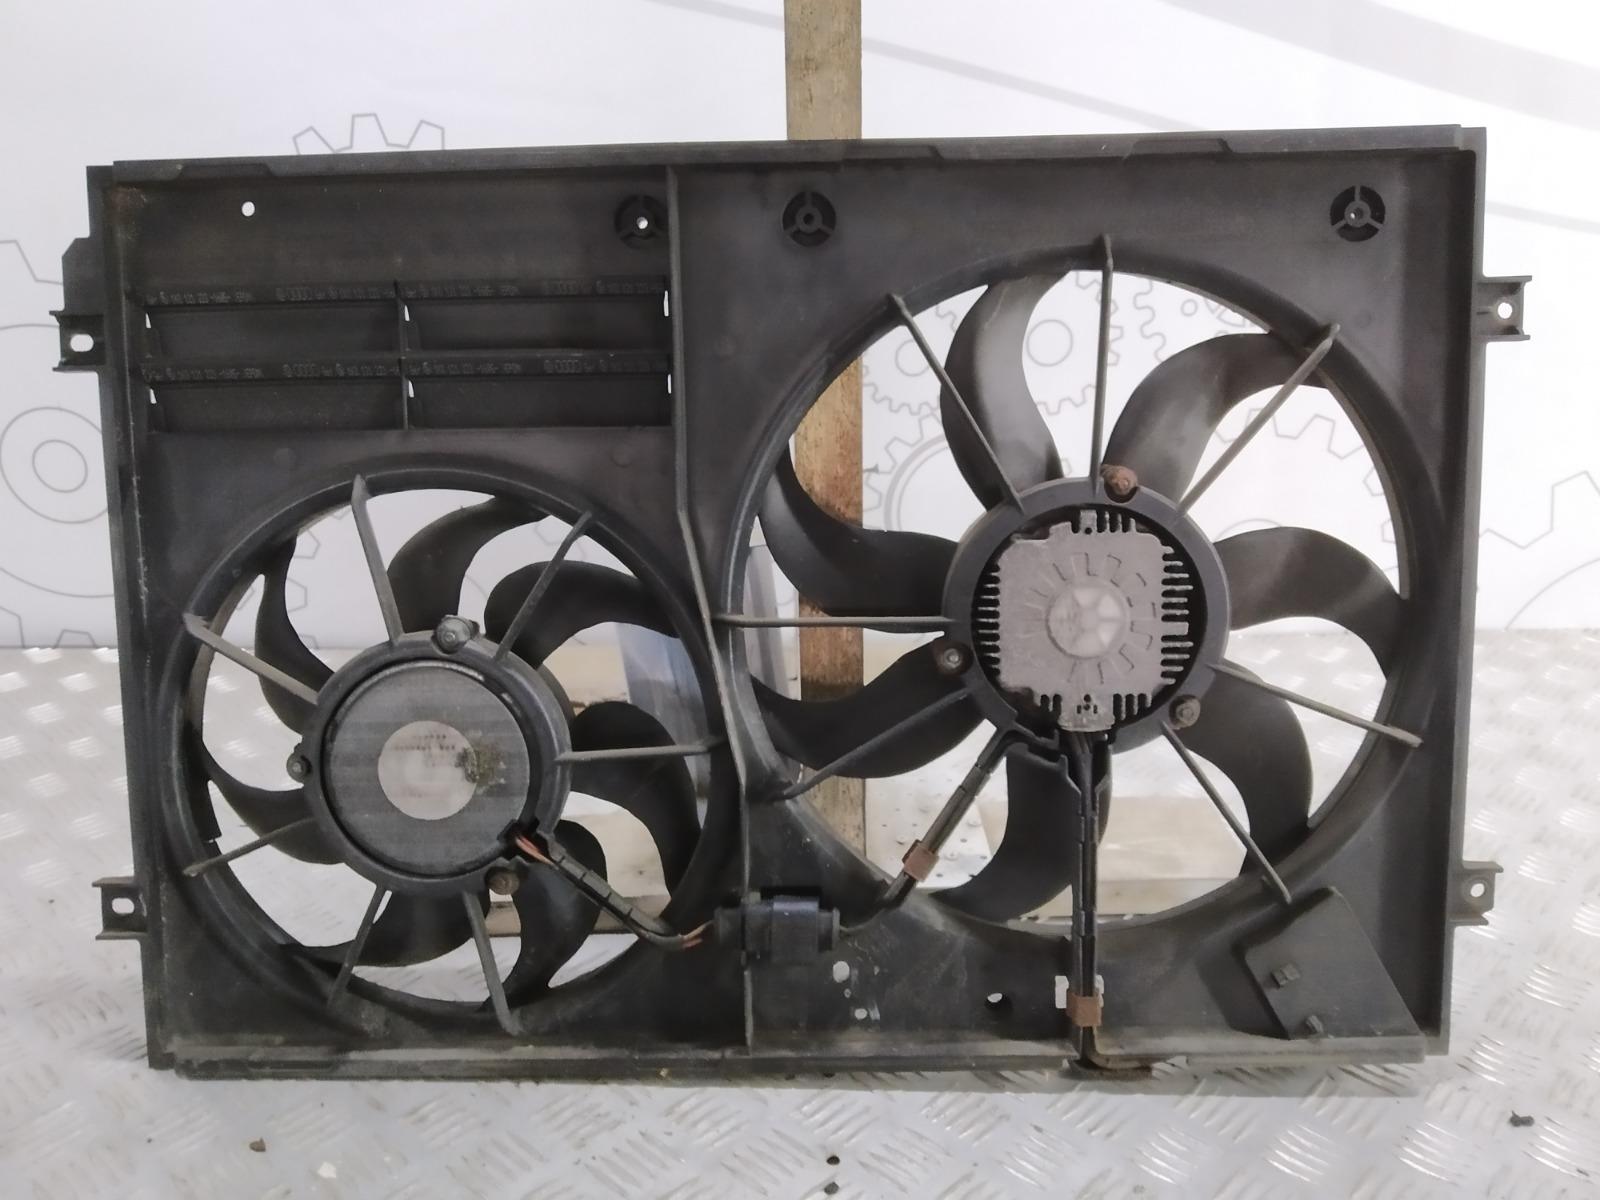 Вентилятор радиатора Volkswagen Golf 5 2.0 TDI 2005 (б/у)